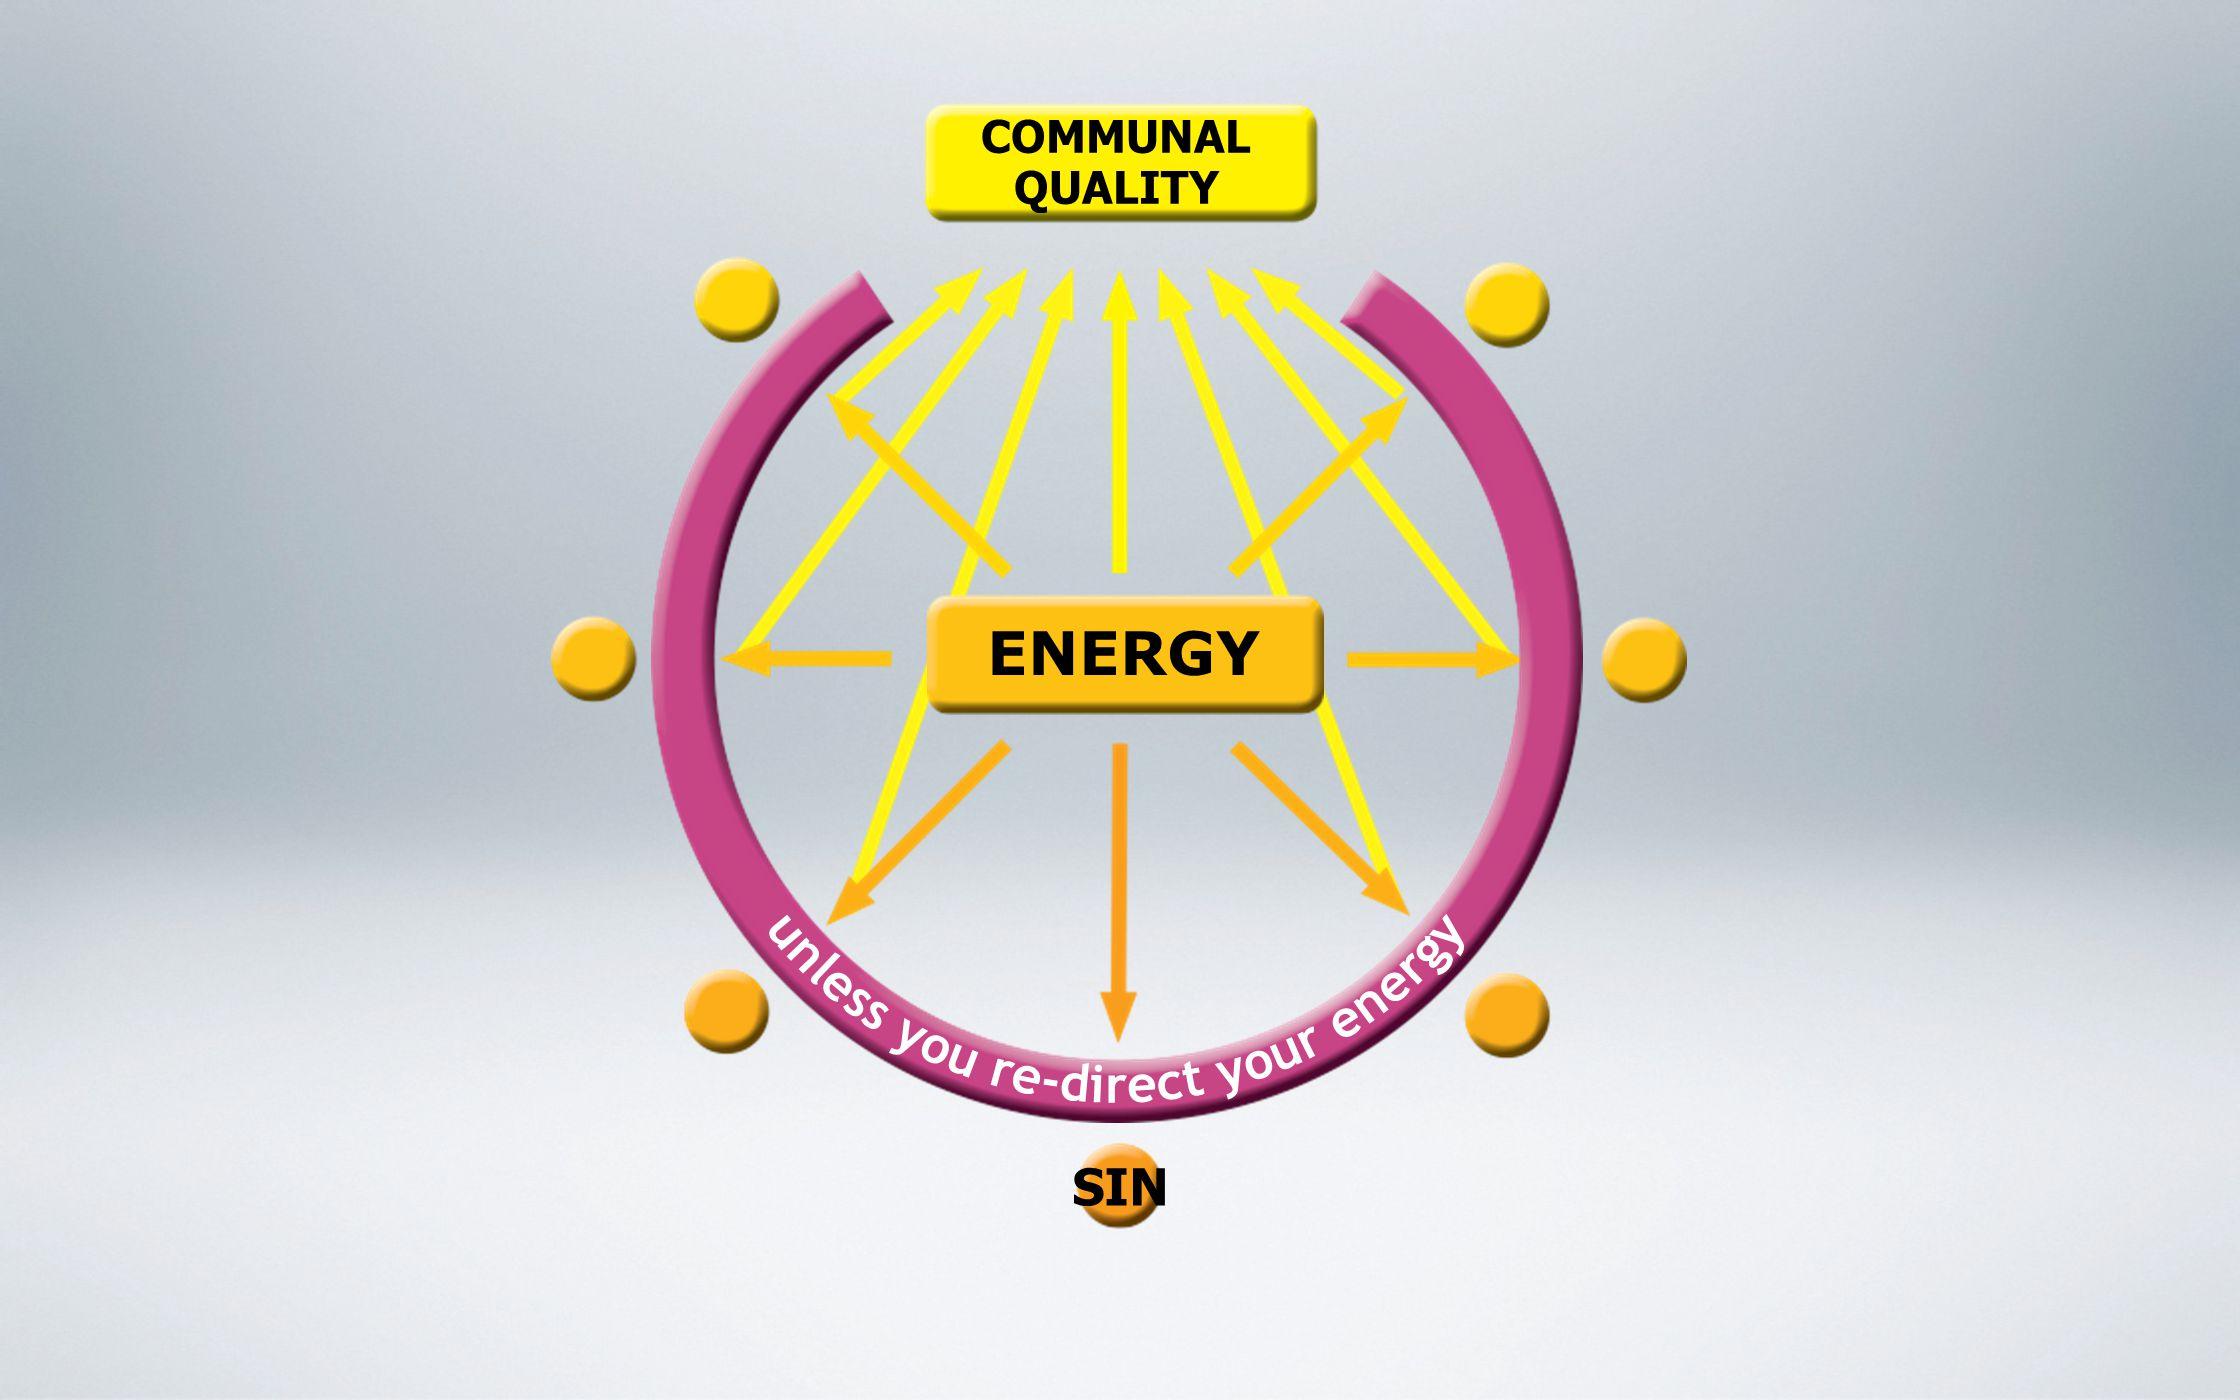 SIN COMMUNAL QUALITY ENERGY